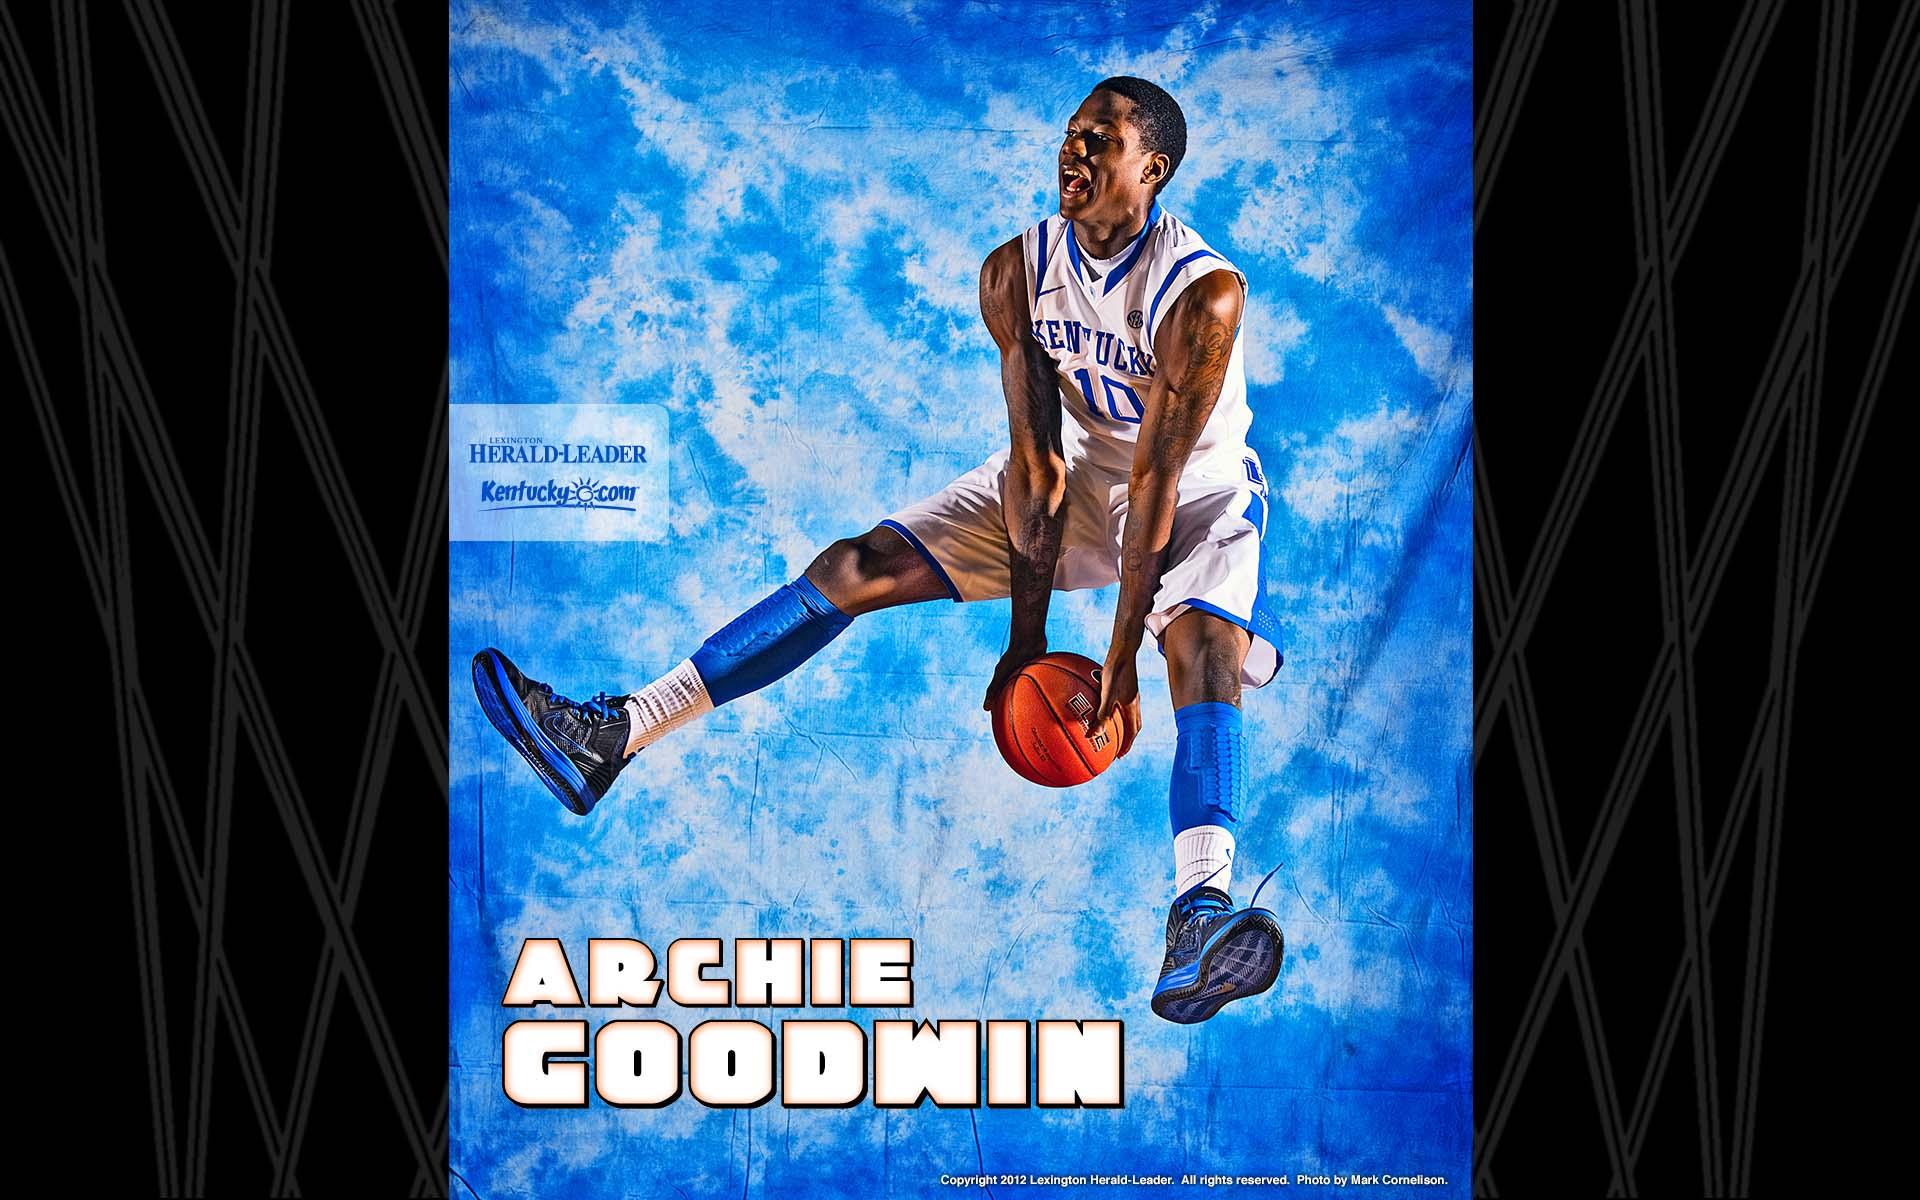 Kentucky Basketball Images We Ll Leave You In Blue Dust Hd: Uk Basketball Wallpaper For Pinterest@Share On Uk